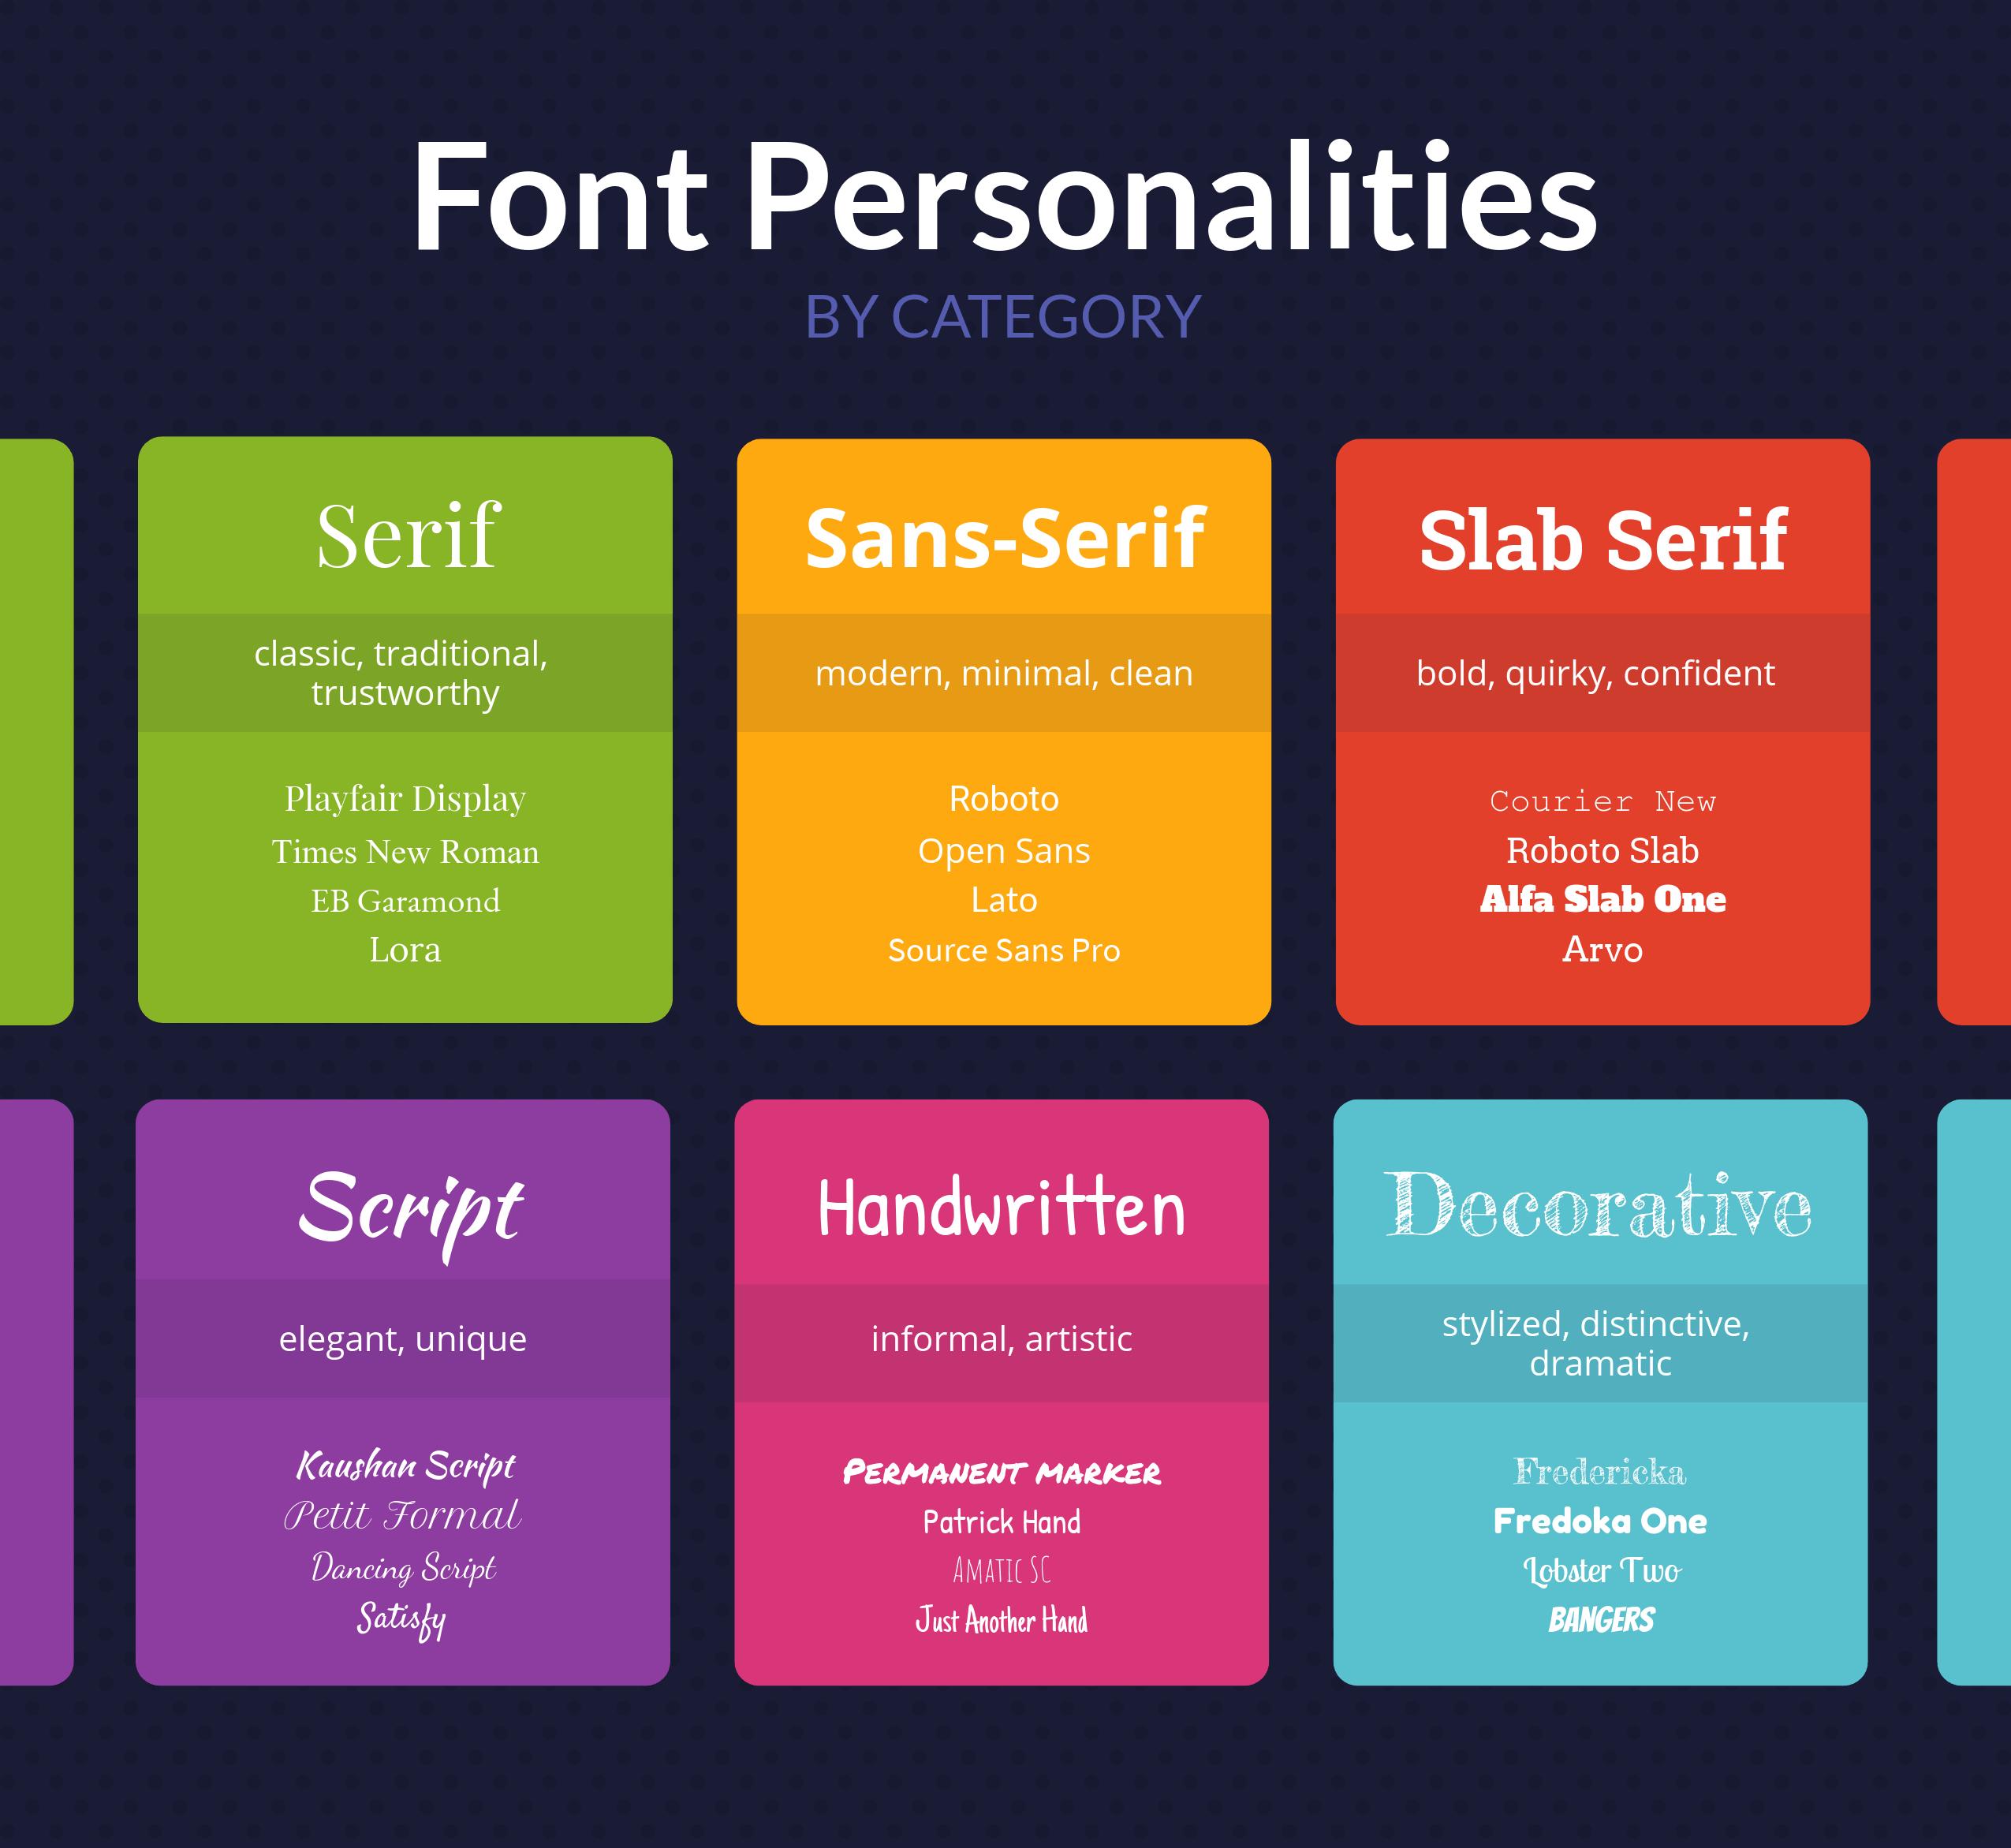 fontes design acessivel